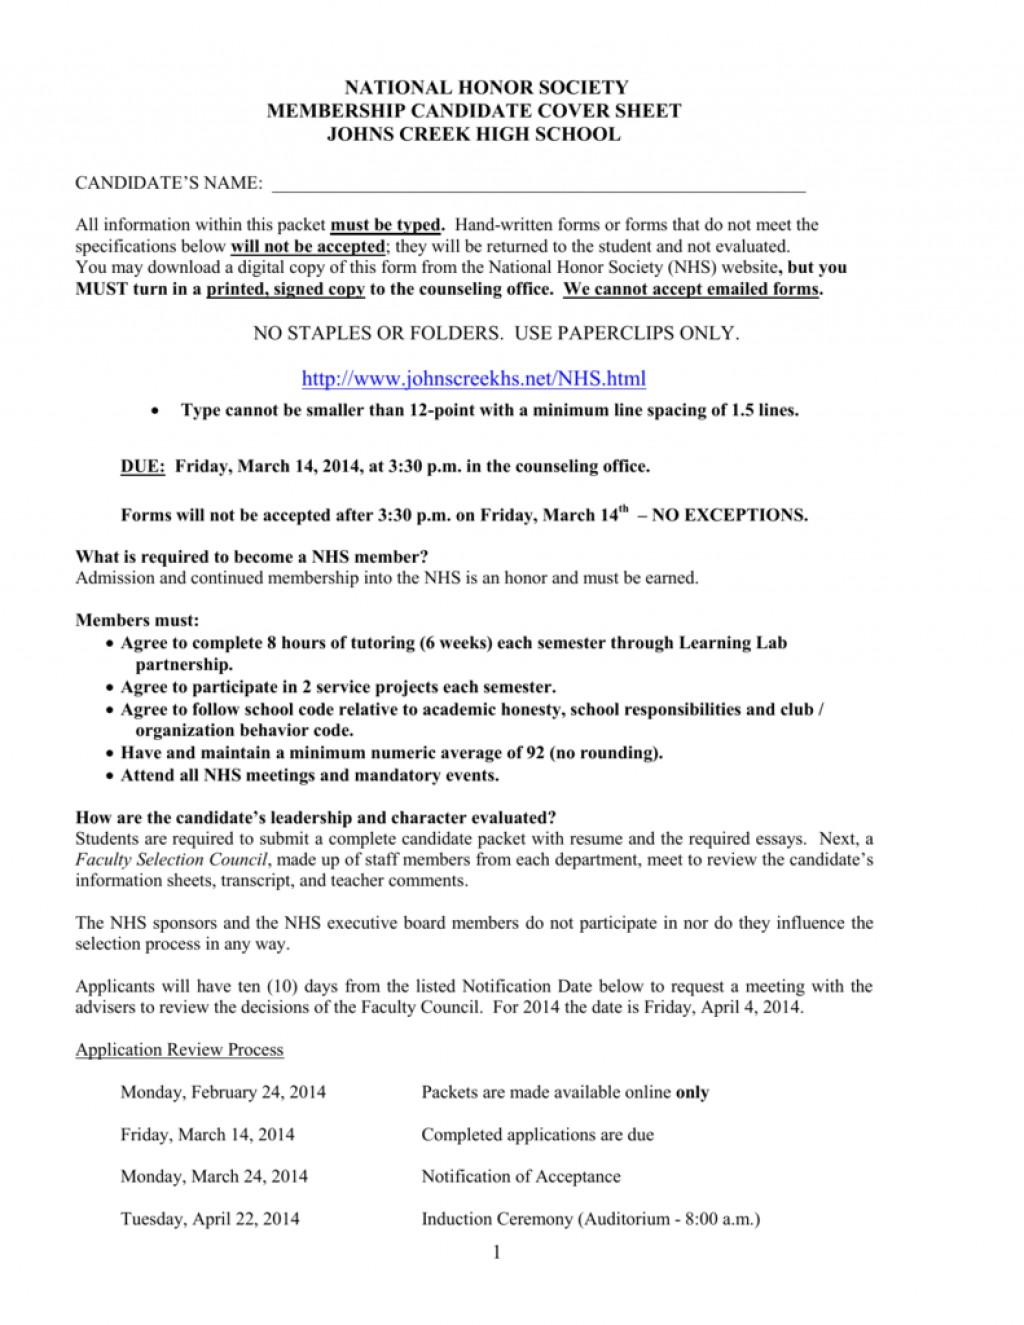 015 National Honor Society Application Essay 008823851 1 Sensational Examples Service Junior Scholarship Large